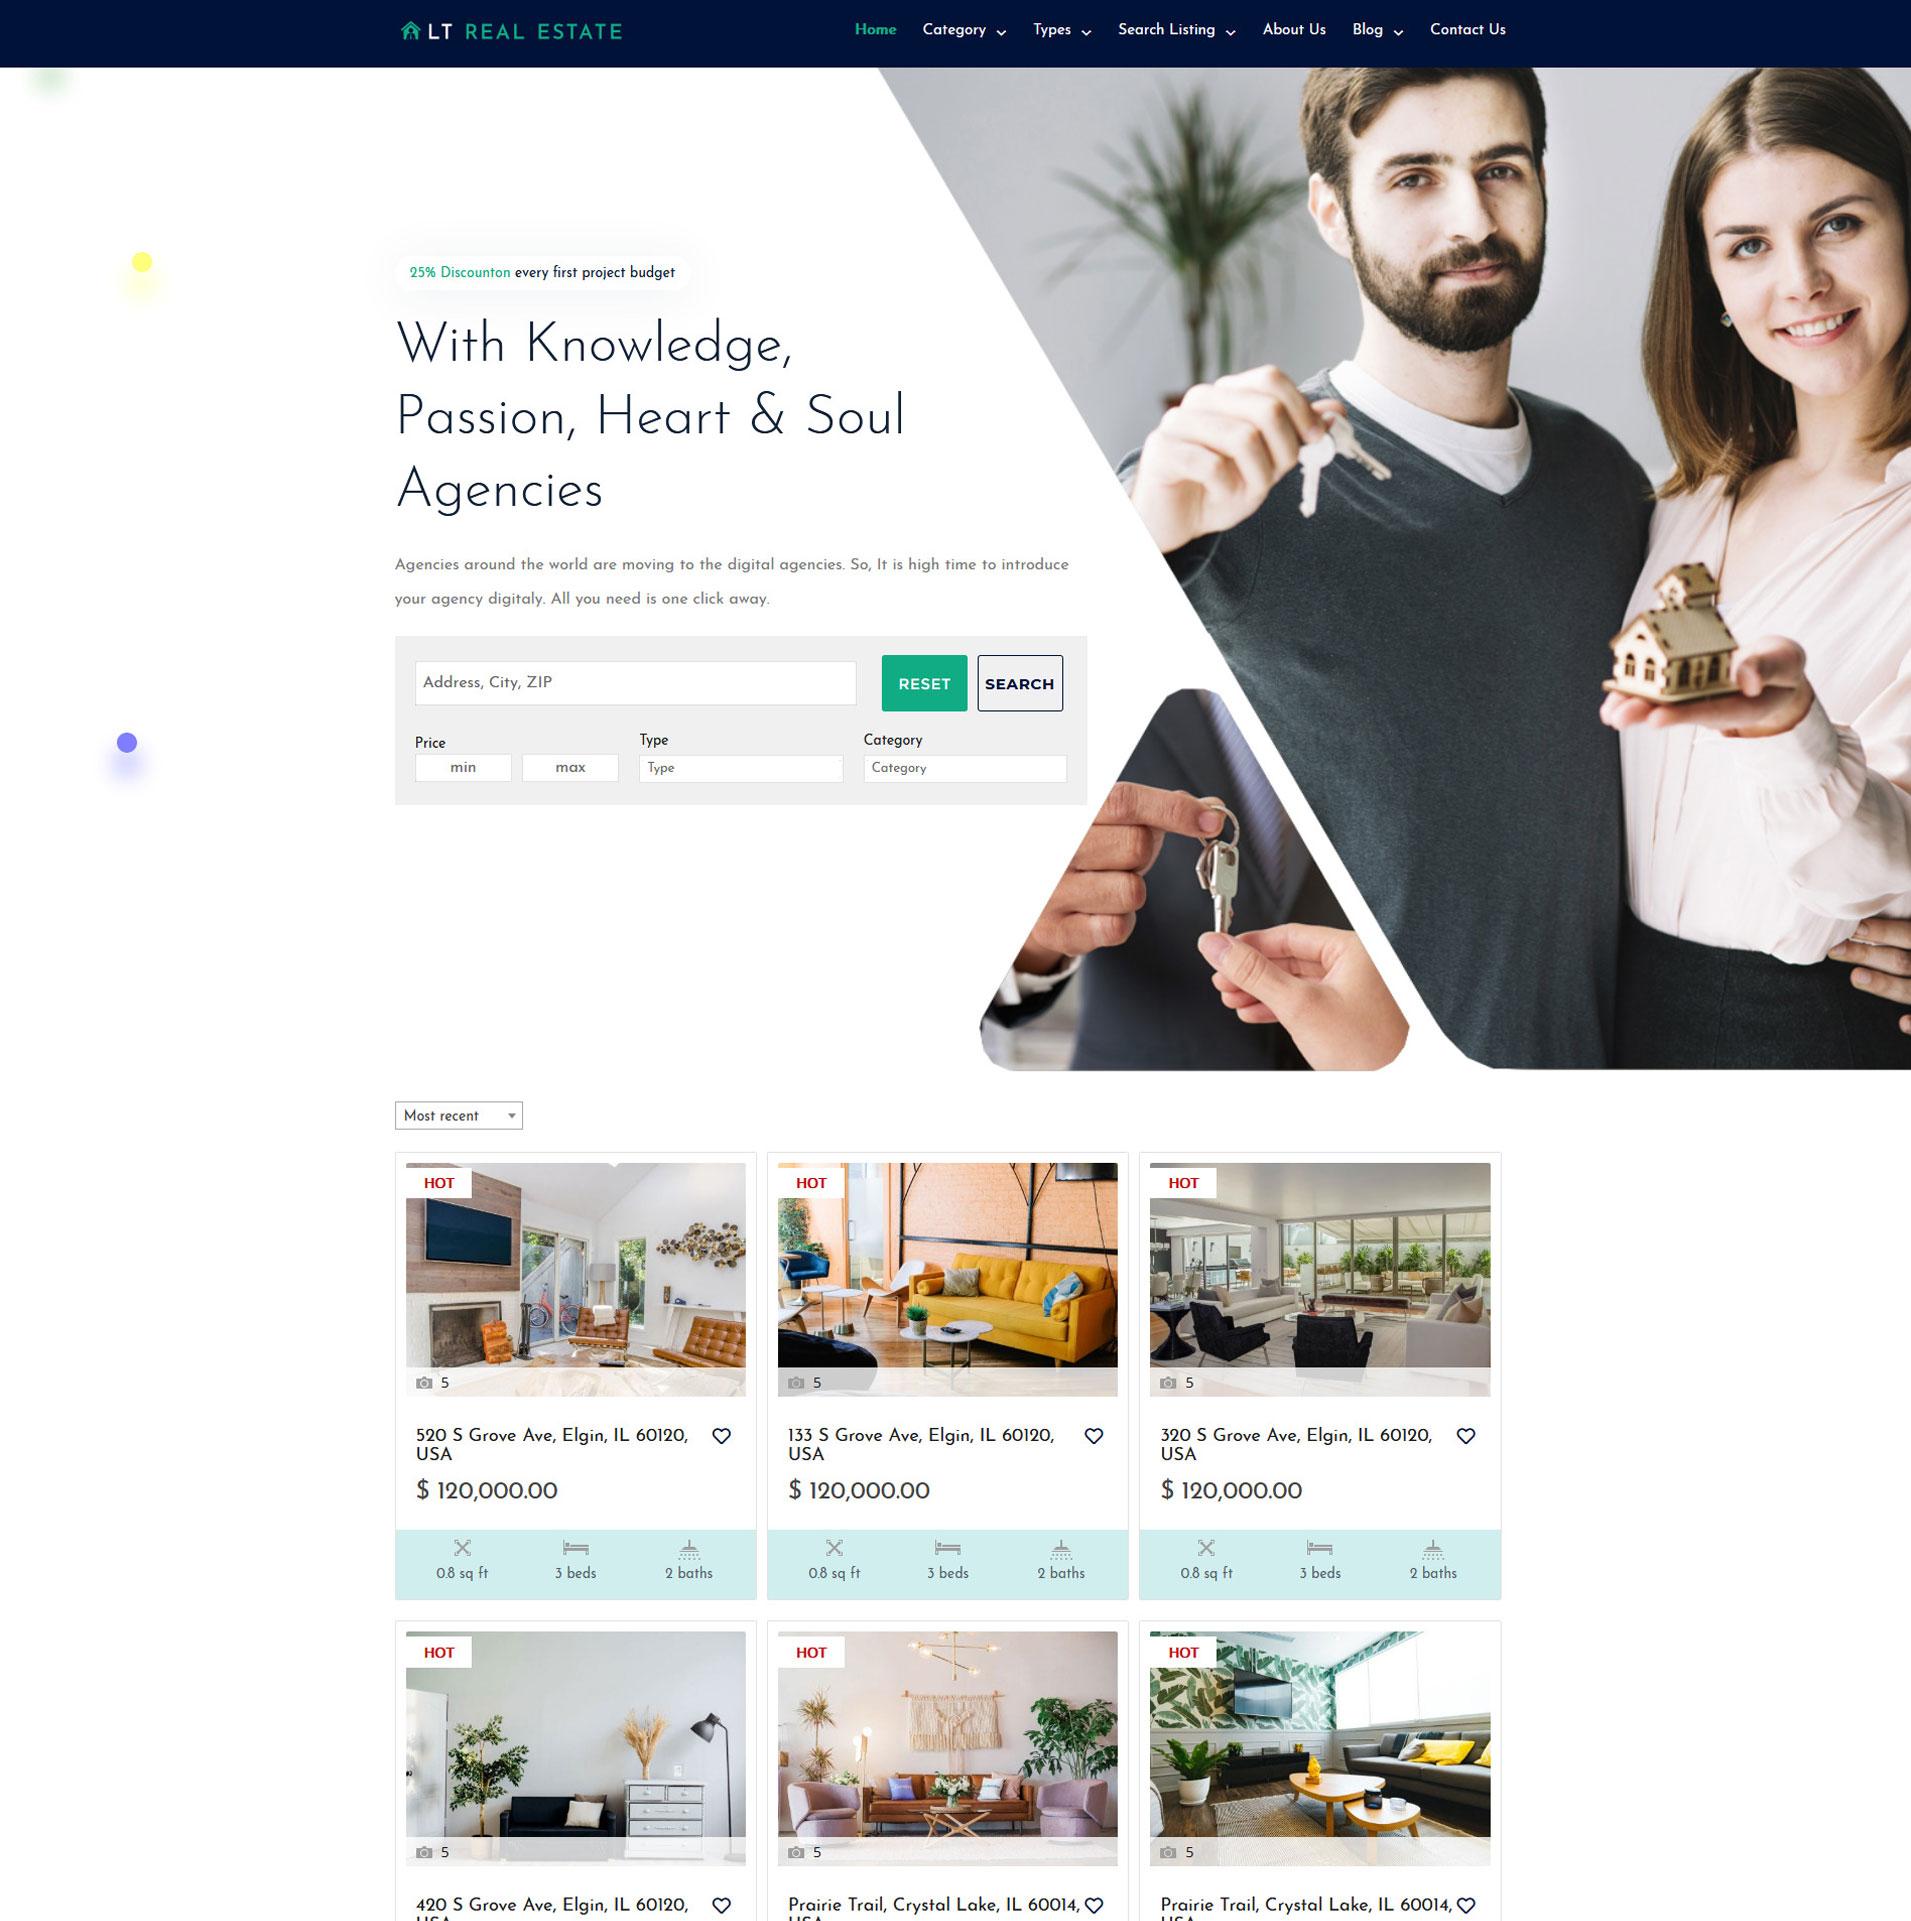 lt-real-estate-free-responsive-elementor-wordpress-theme